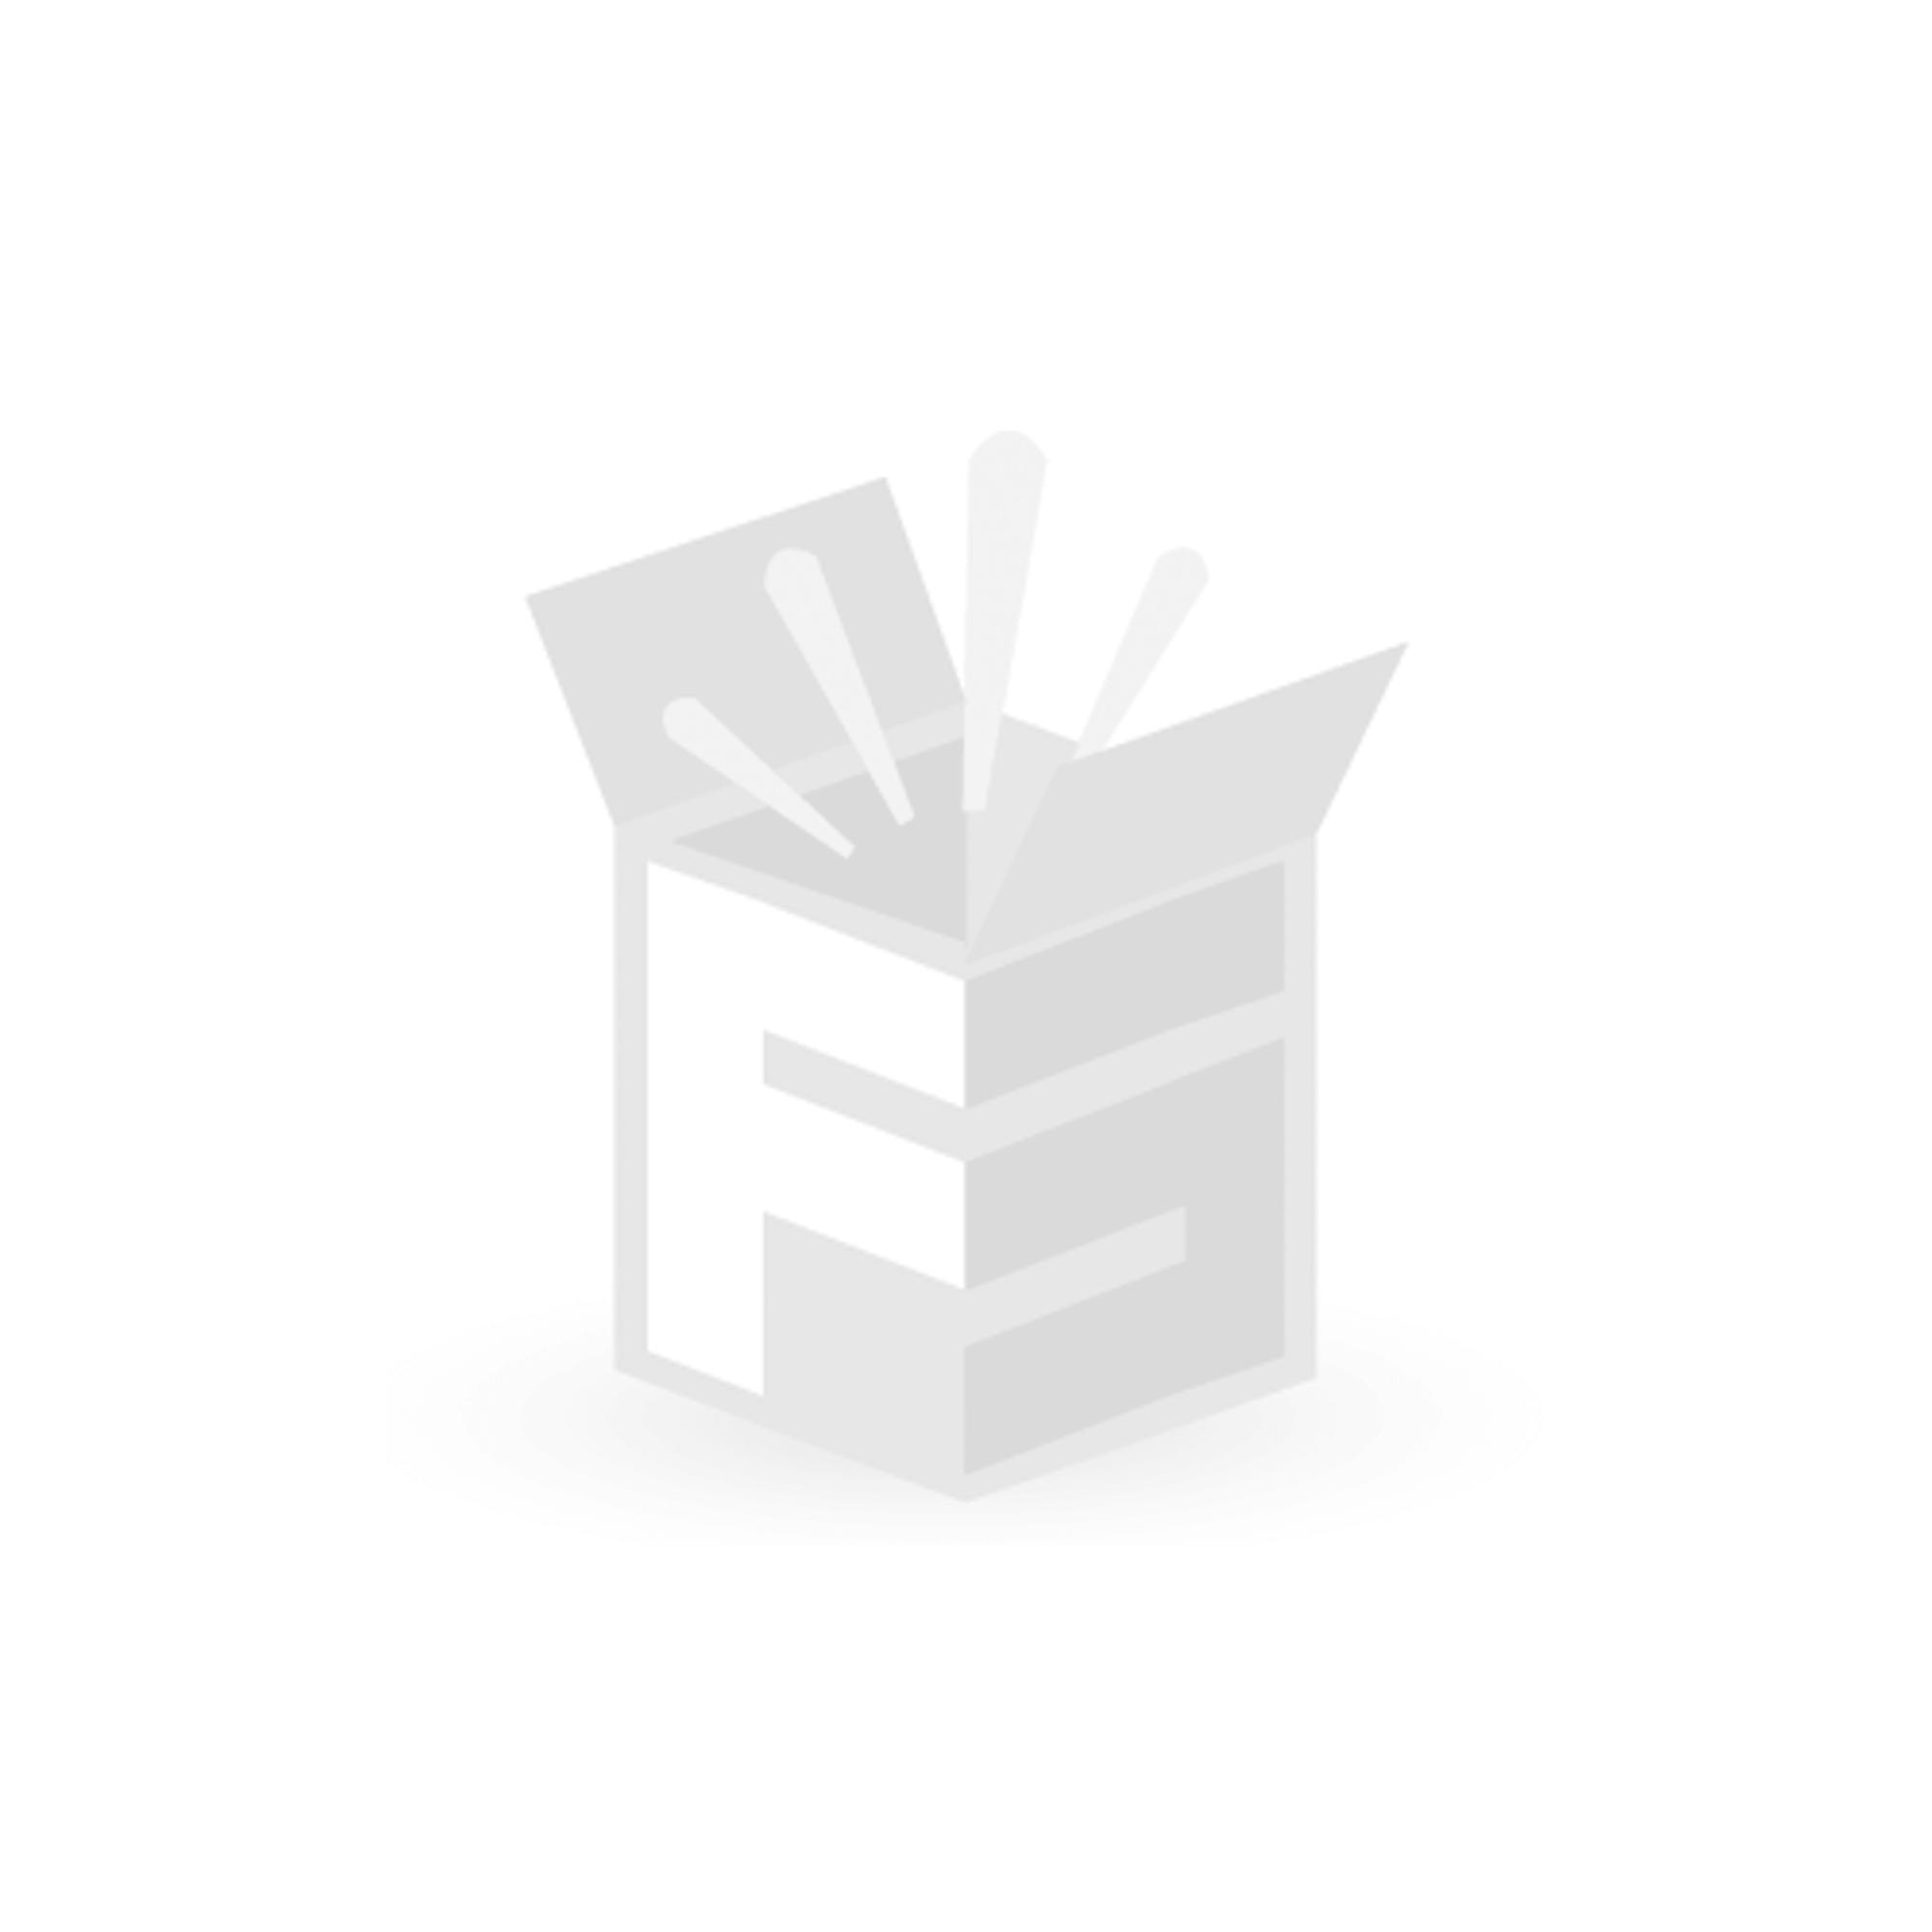 FS-STAR Eiswürfel Jumbo, 6 Stück